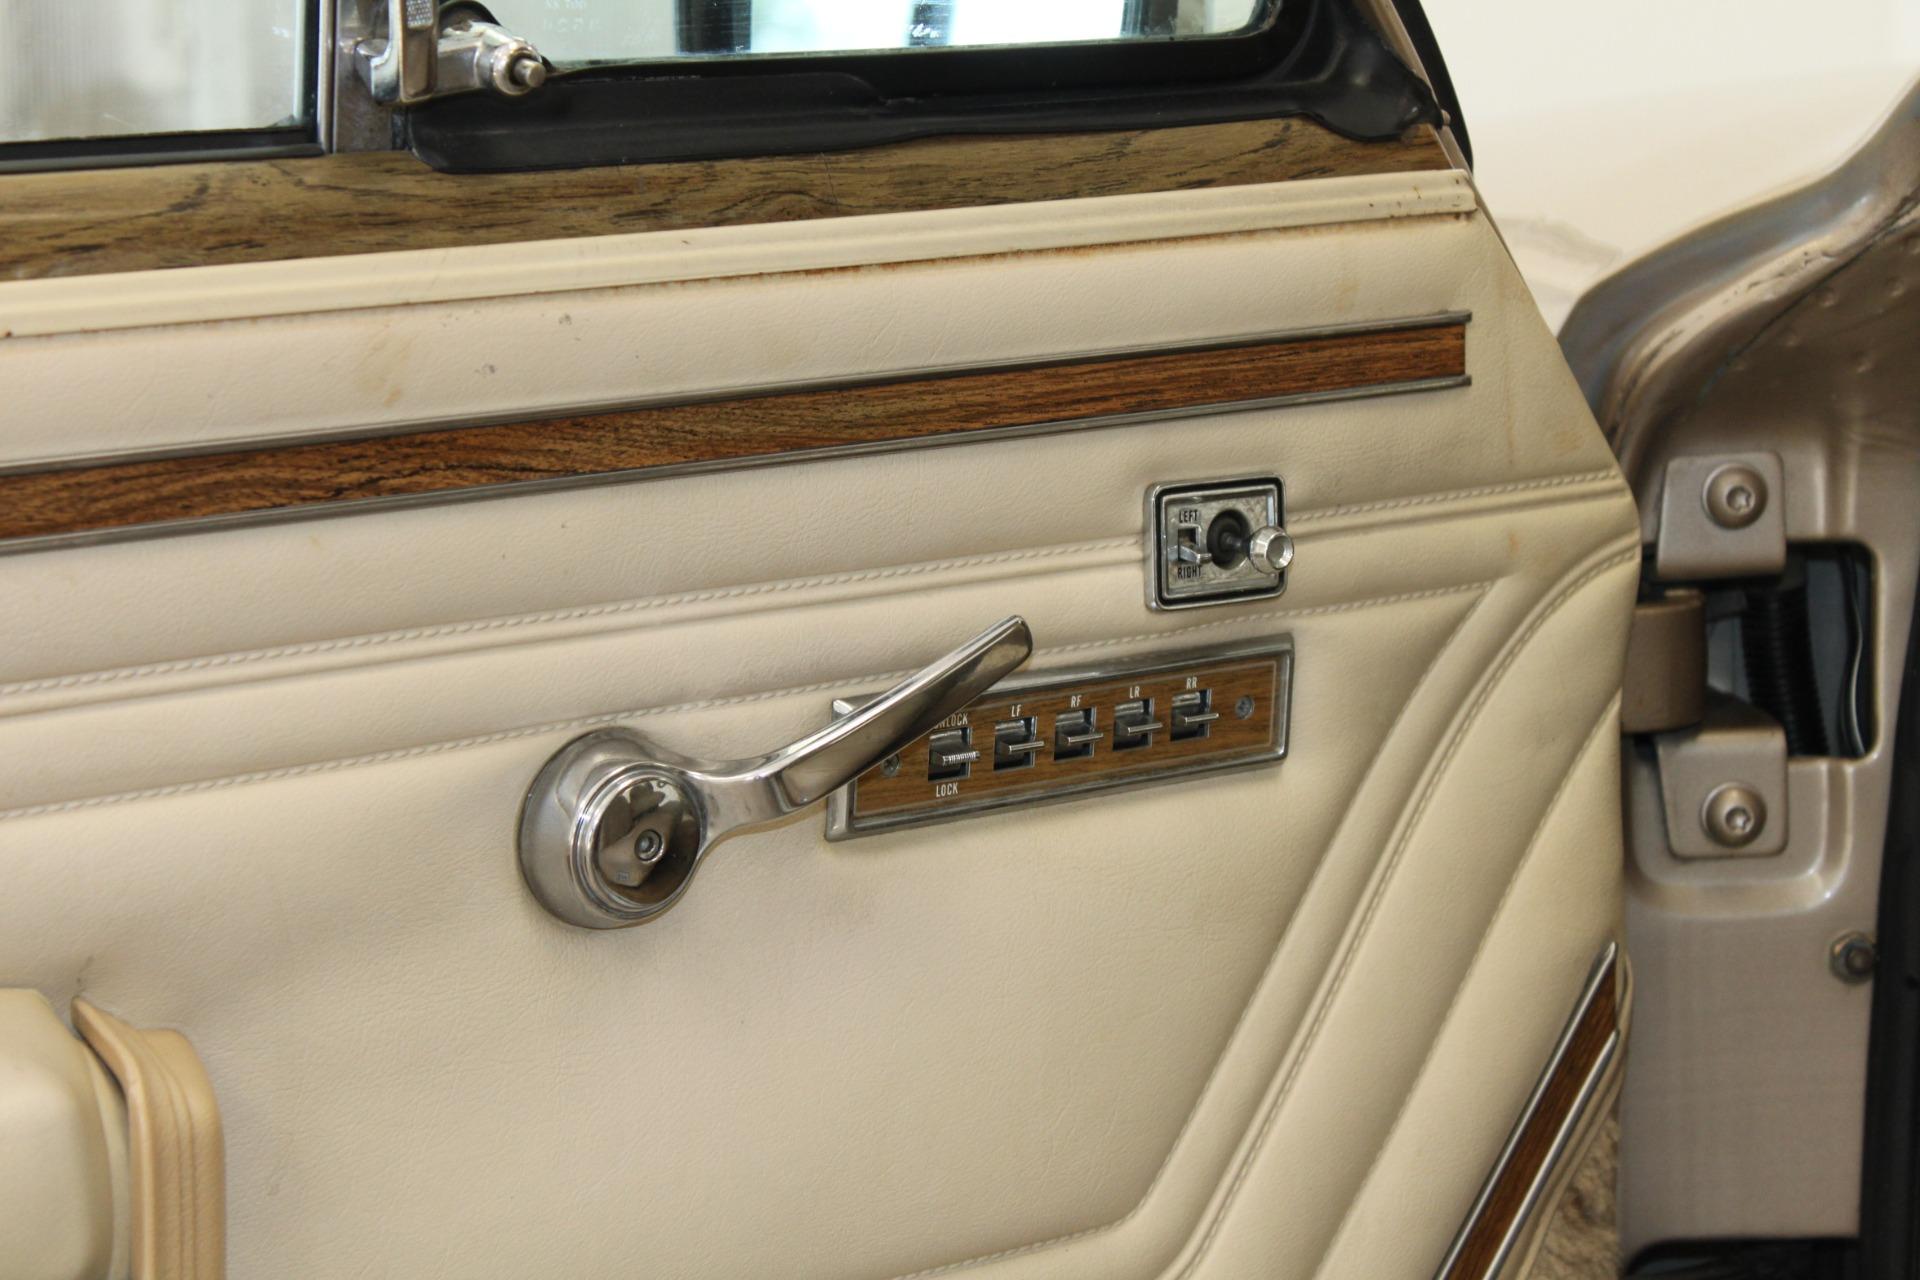 Used-1990-Jeep-Grand-Wagoneer-Grand-Wagoneer